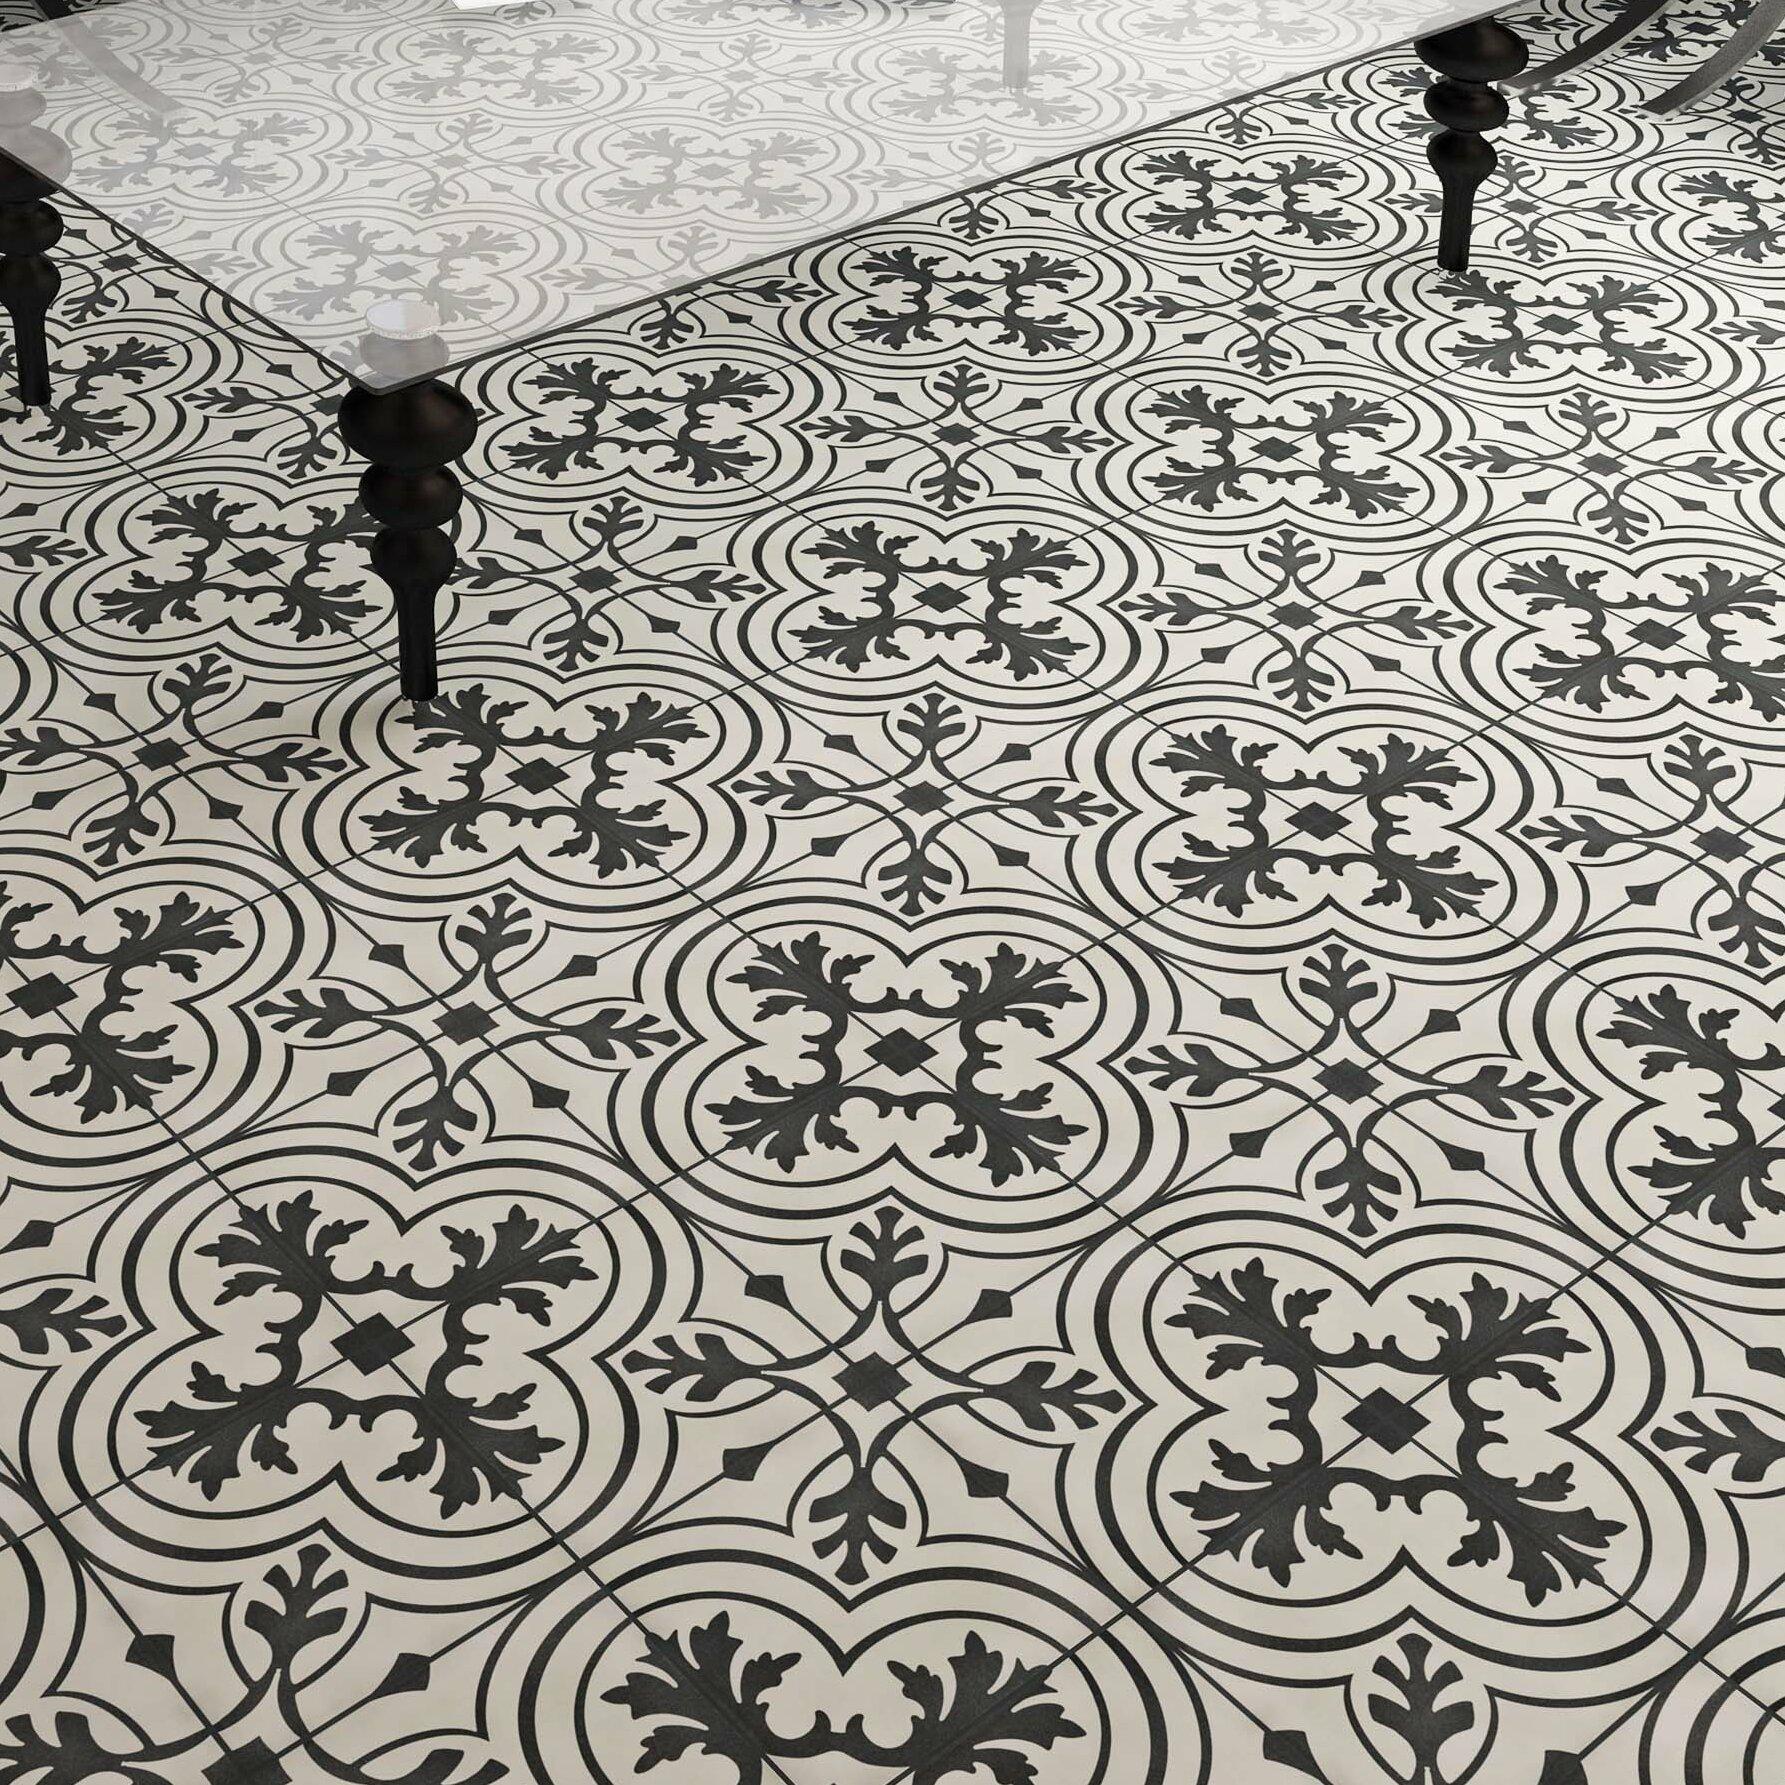 Elitetile wayfair forties 775 x 775 ceramic field tile in vintage charcoaloff white dailygadgetfo Choice Image